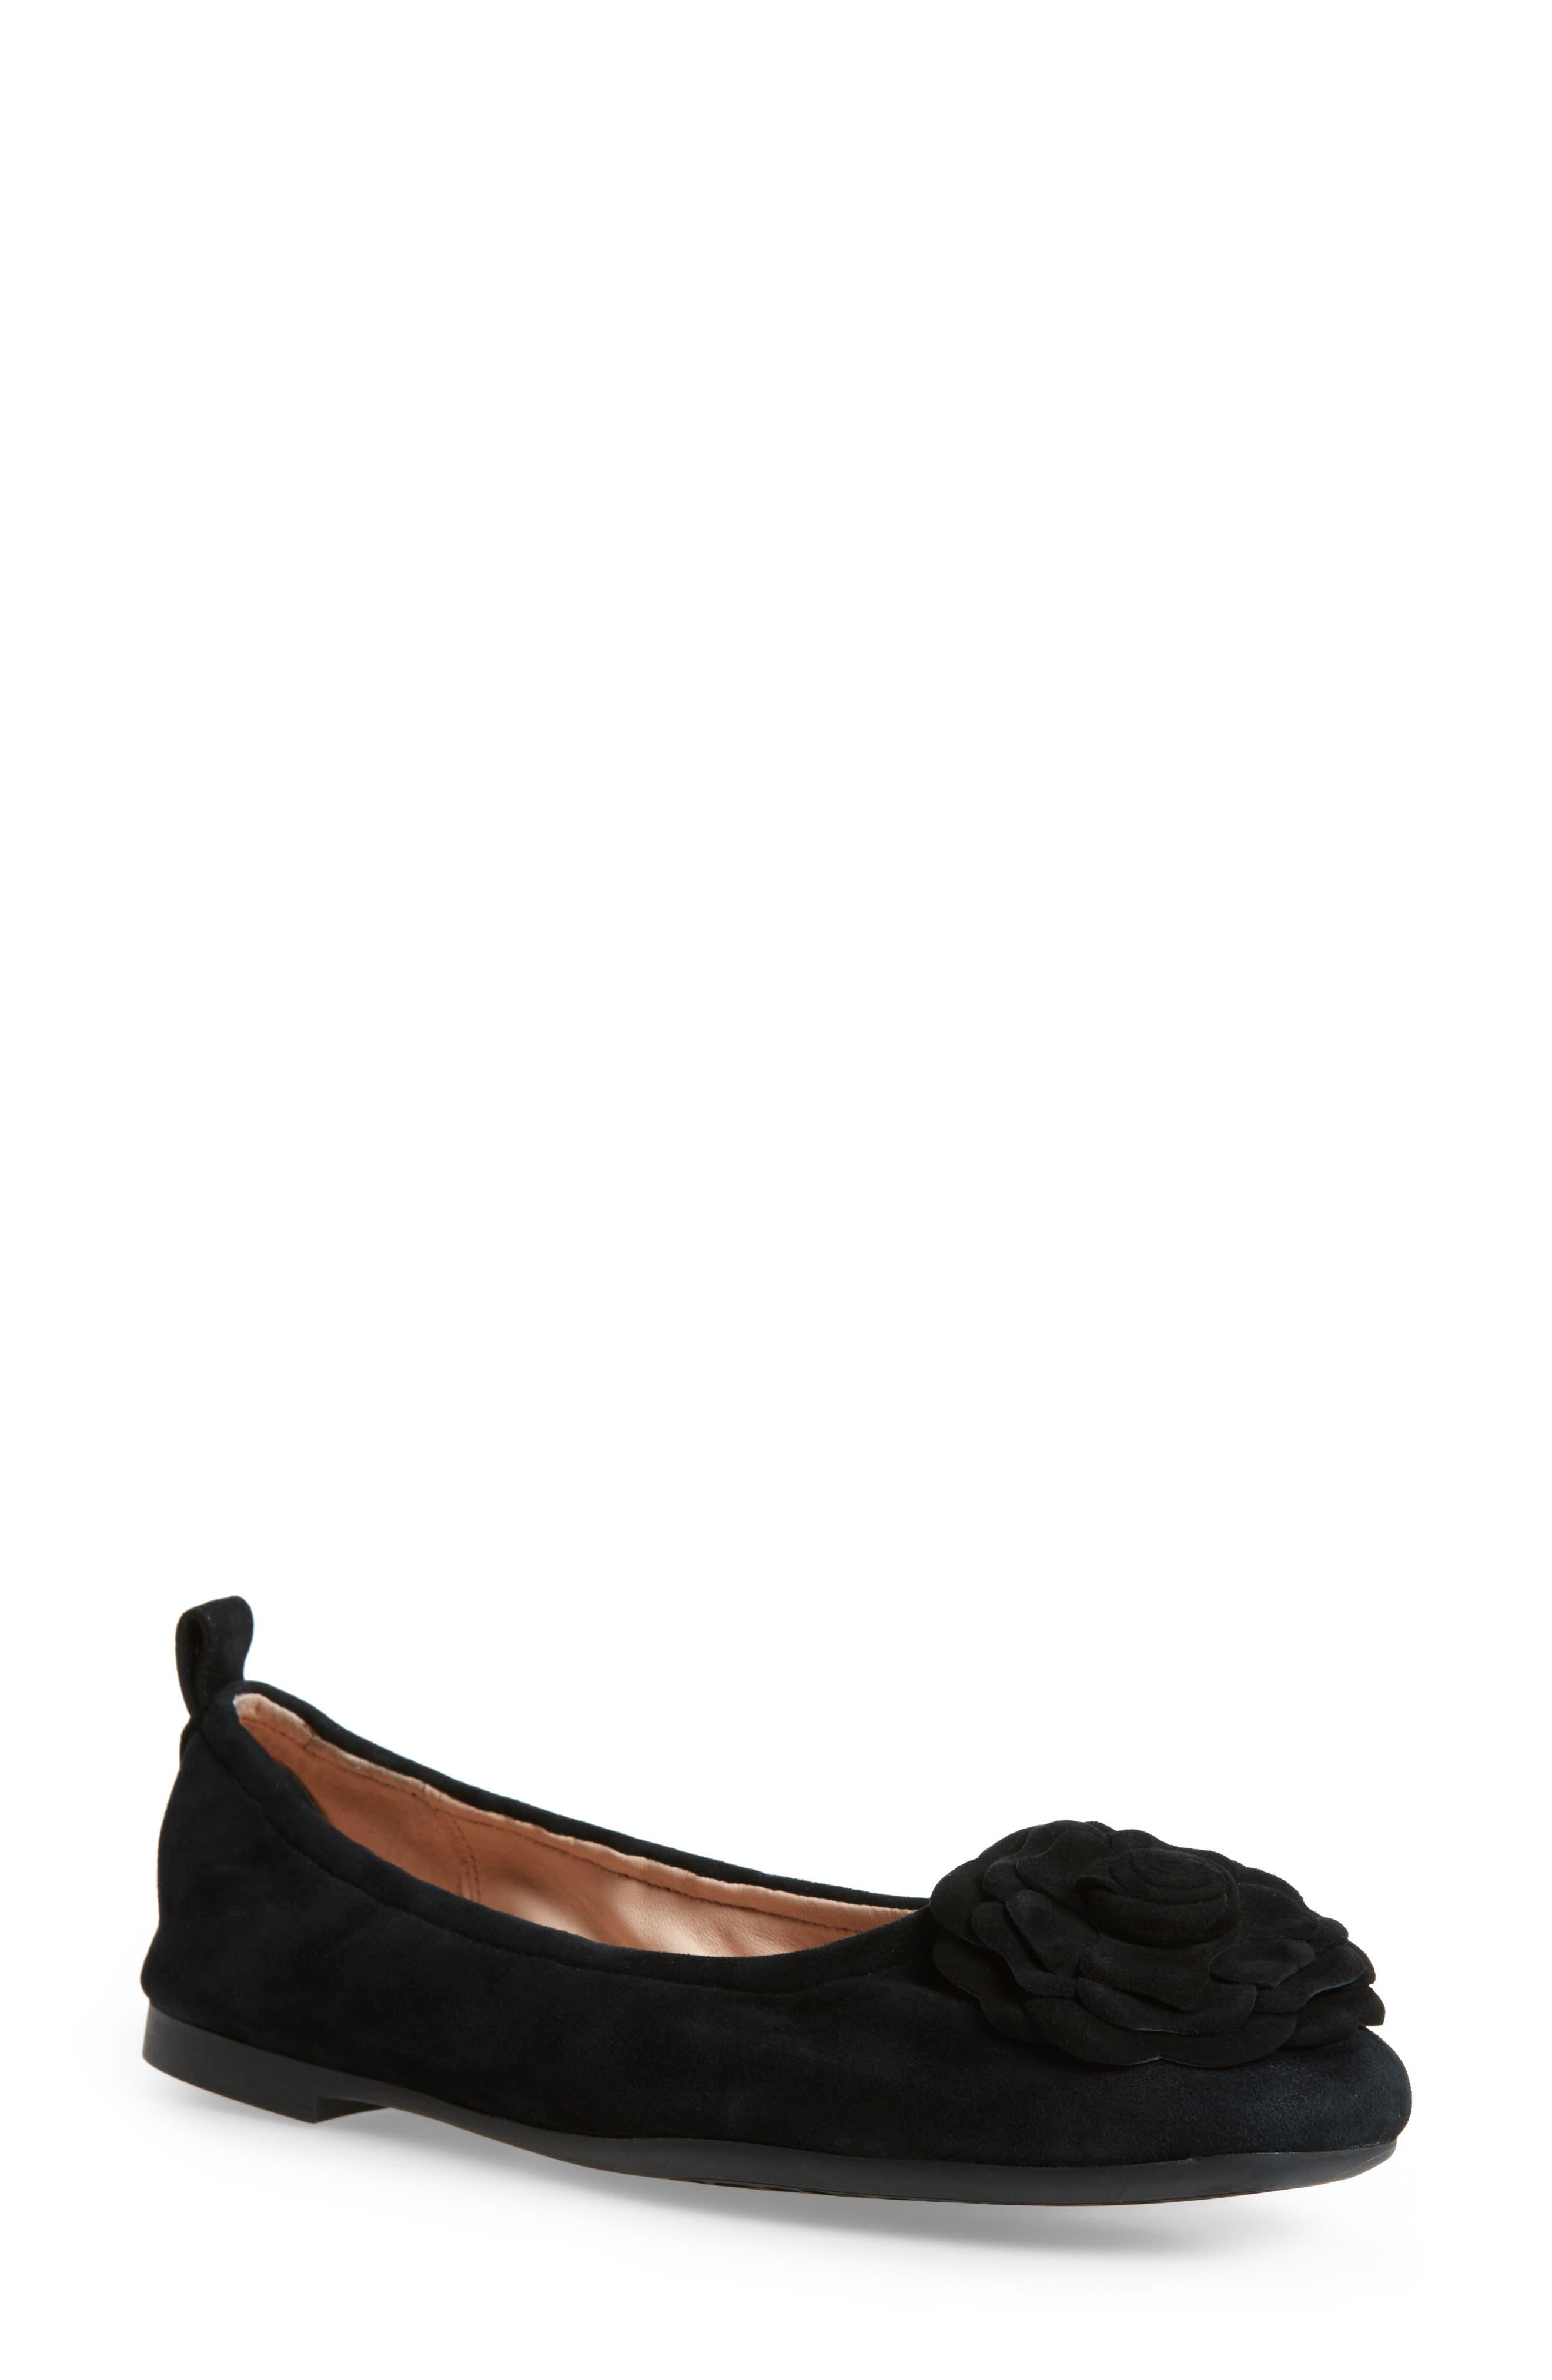 Taryn Rose Rosalyn Ballet Flat, Black